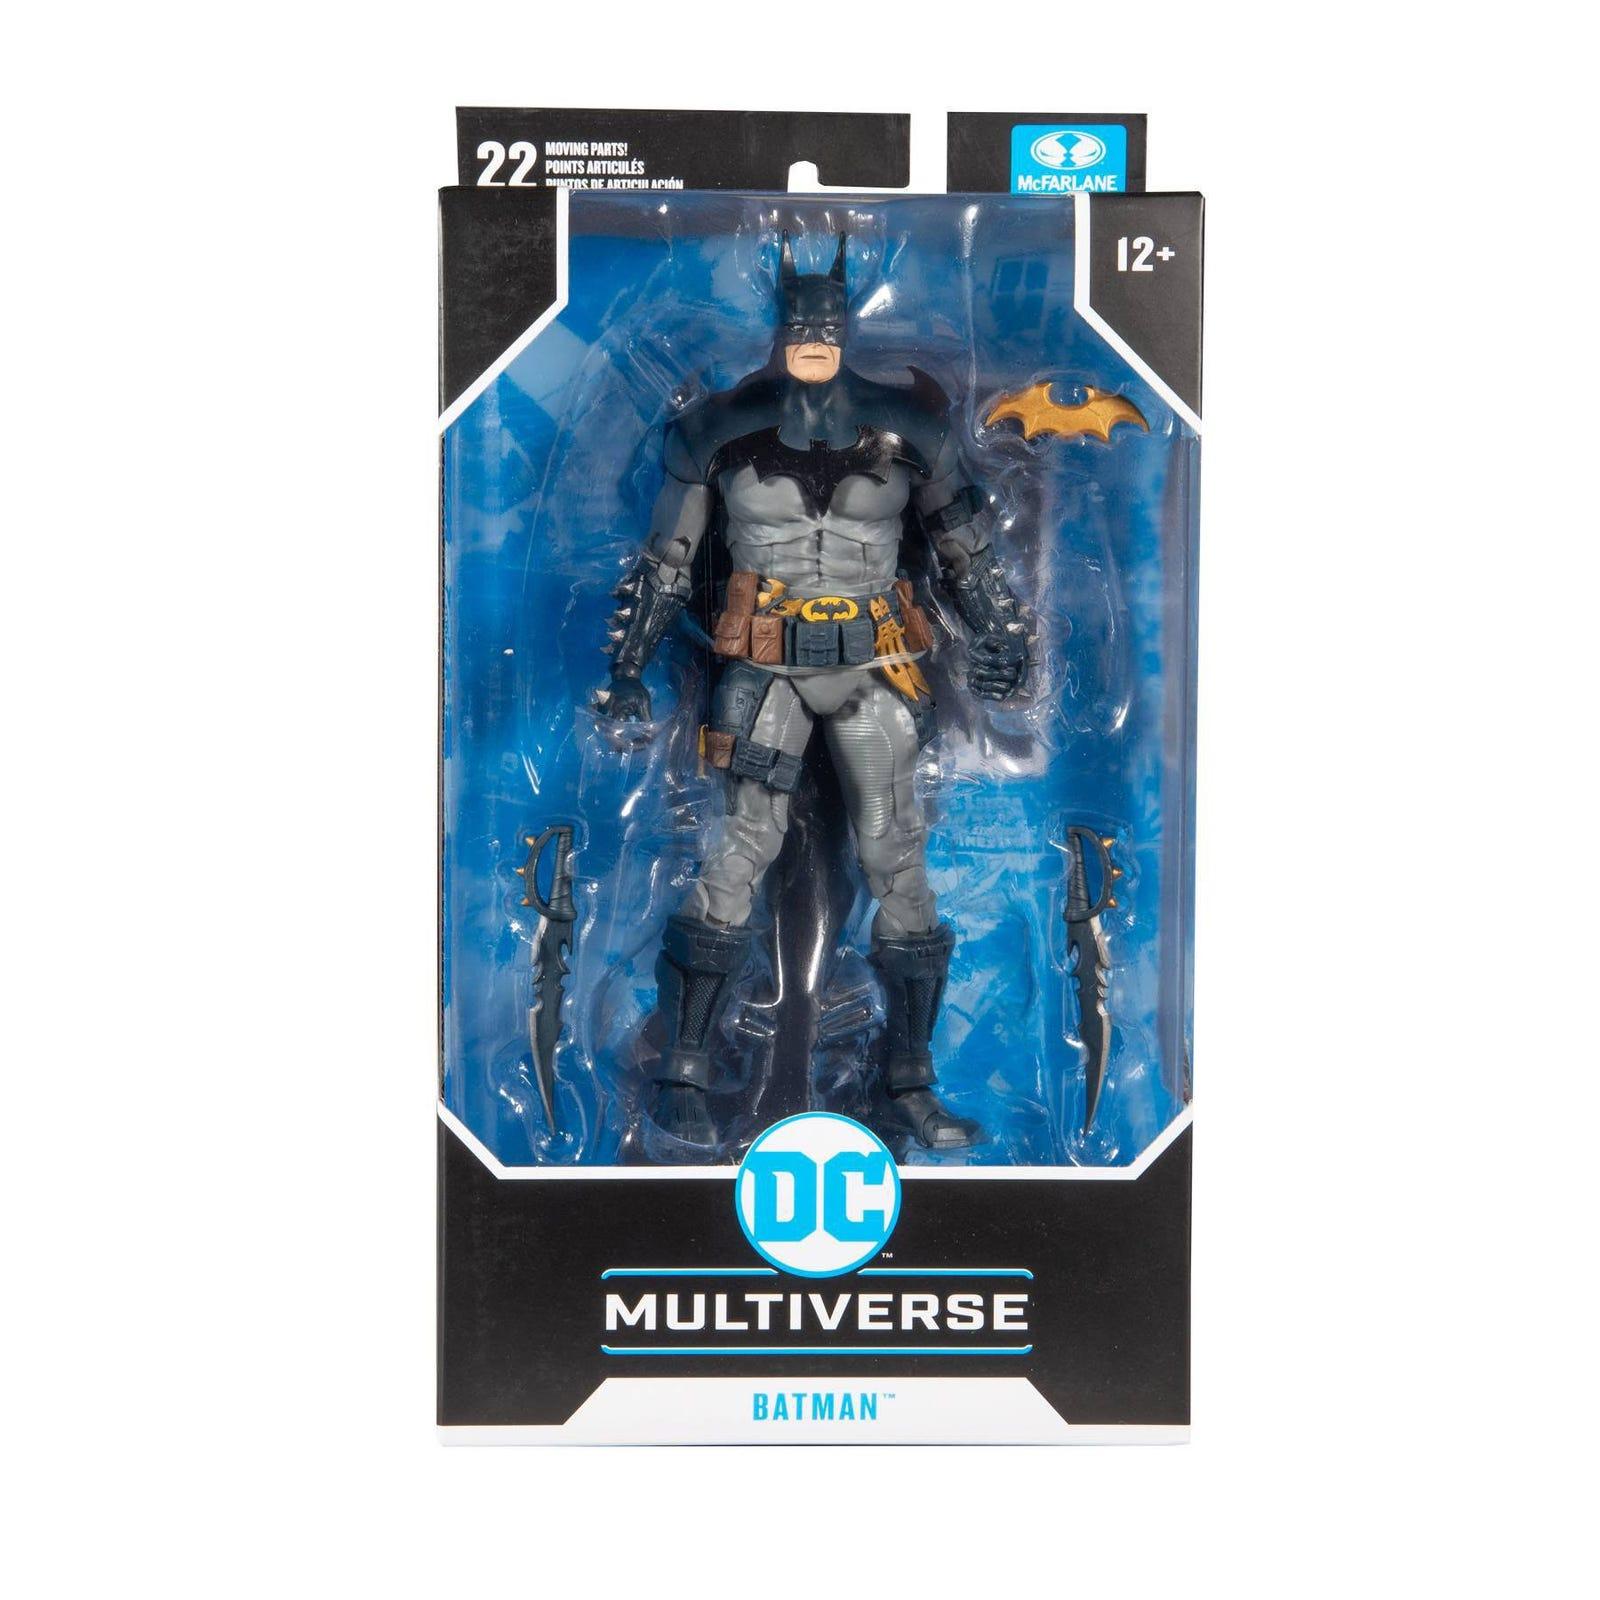 DC Multiverse Actionfigur Batman Designed by Todd McFarlane 18 cm - Preorder Mai 2021  787926150063